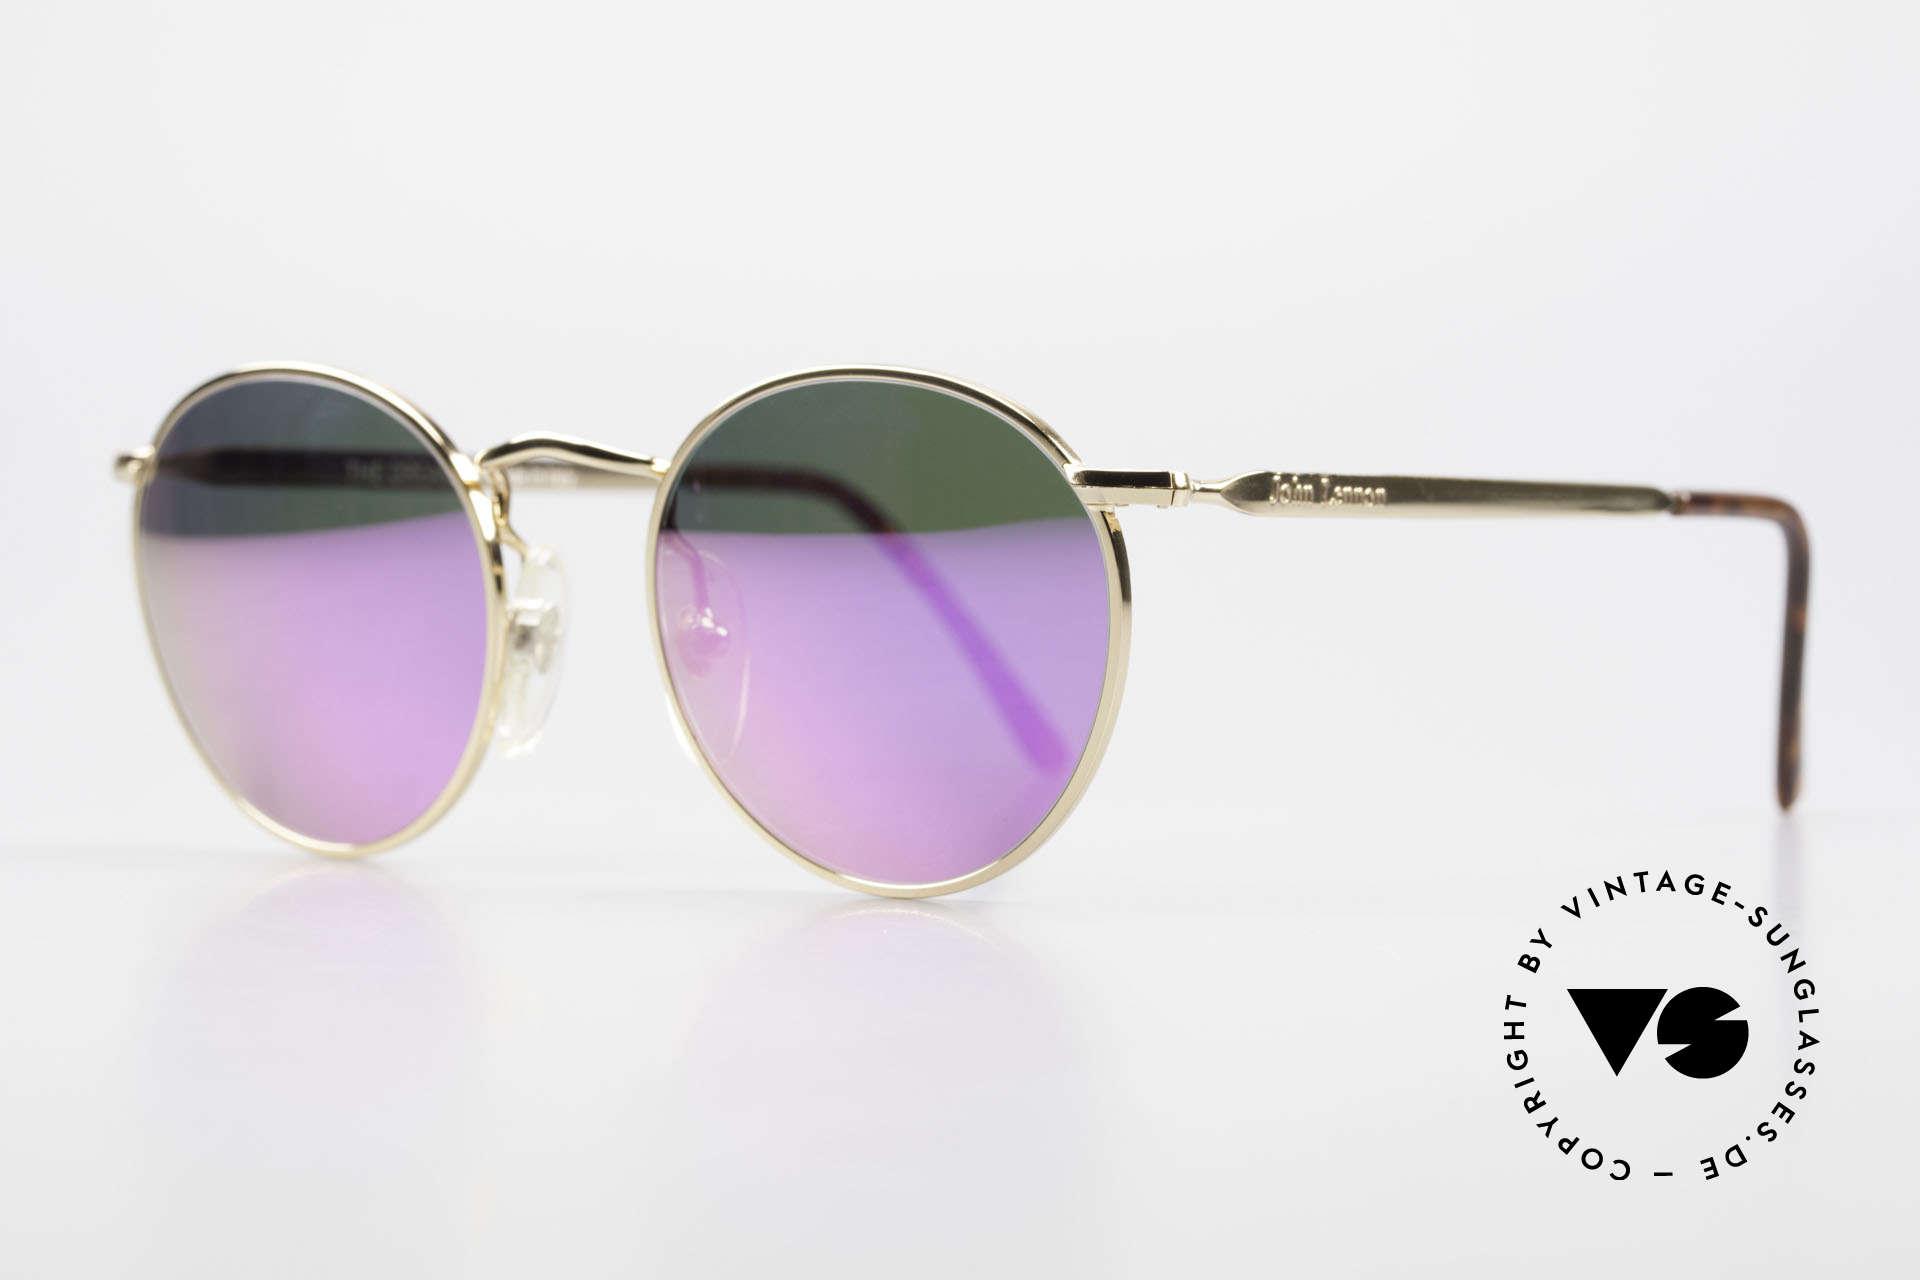 John Lennon - The Dreamer With Pink Mirrored Sun Lenses, all models named after famous J.Lennon / Beatles songs, Made for Men and Women